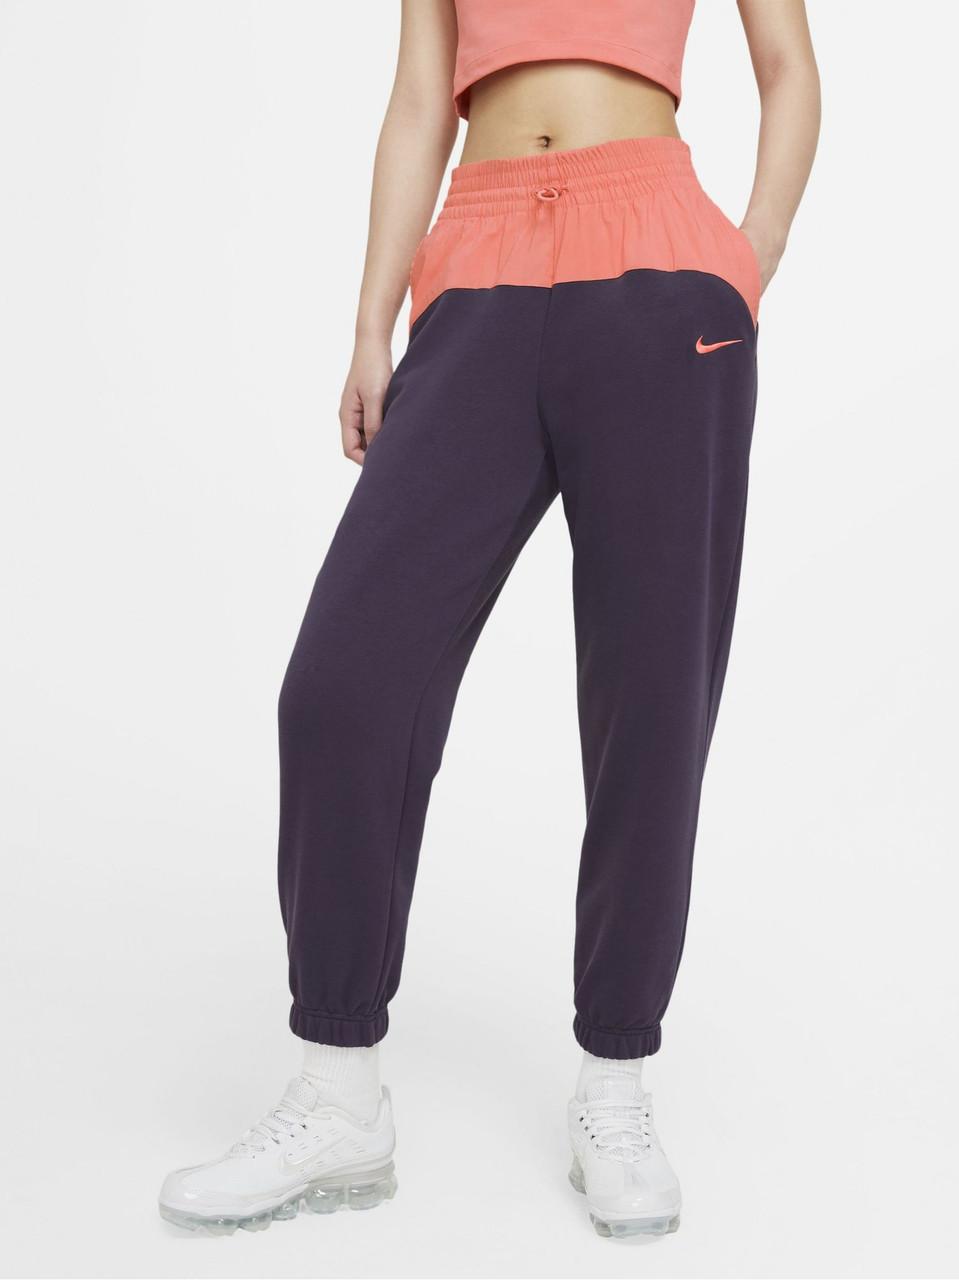 Брюки женские спортивные Nike Sportswear Icon Clash Women Joggers CZ8172-573